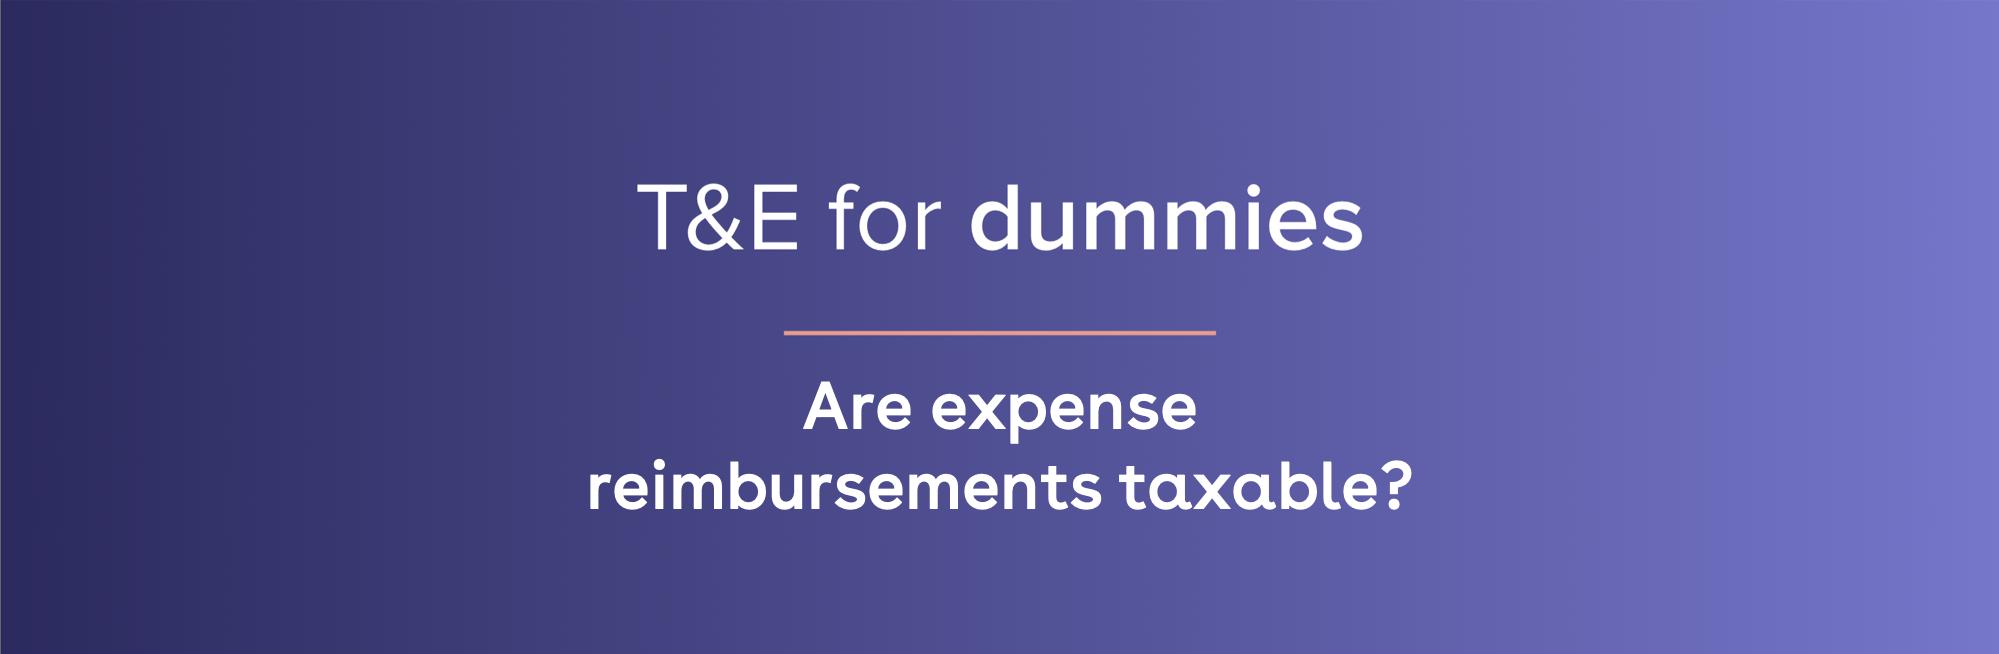 are expense reimbursements taxable